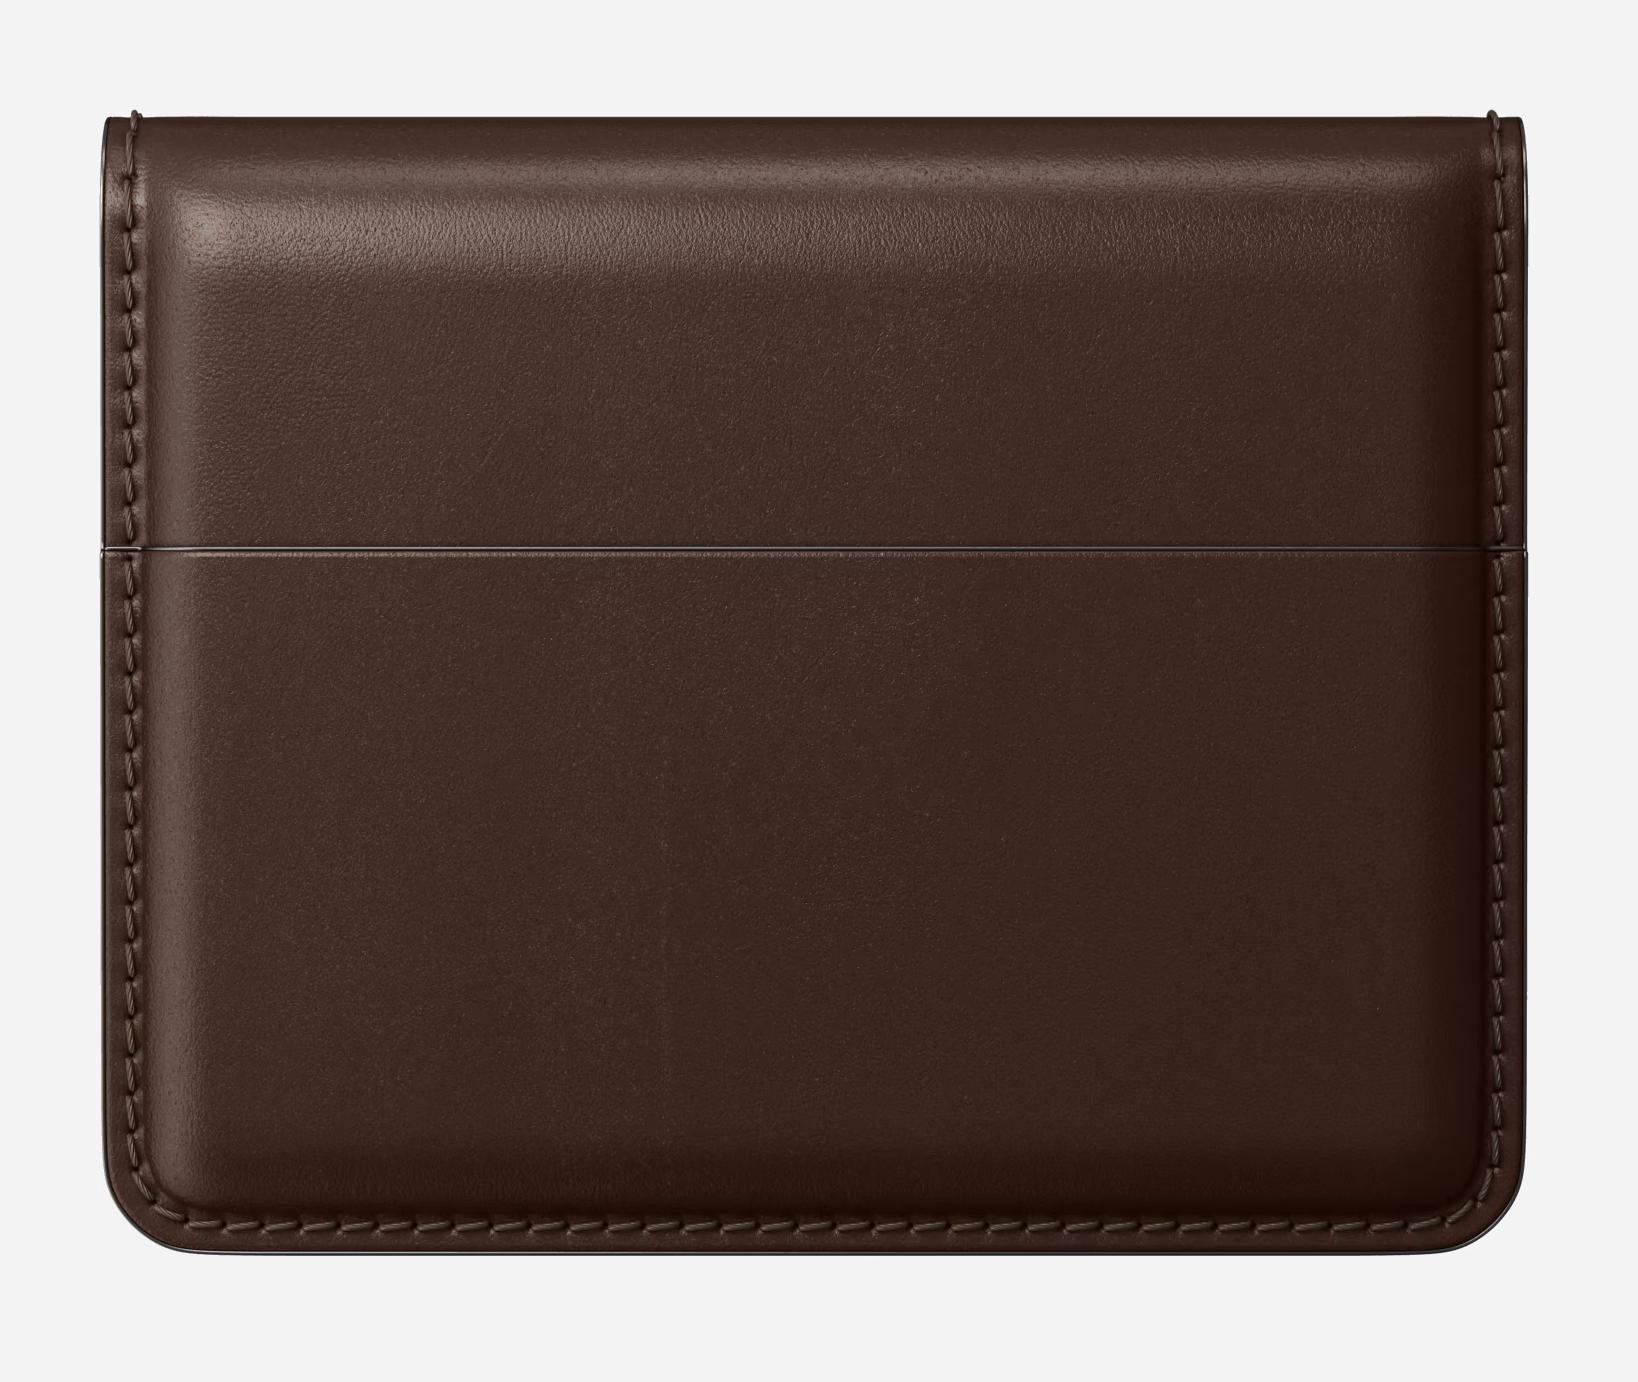 NOMAD Card Plus Wallet